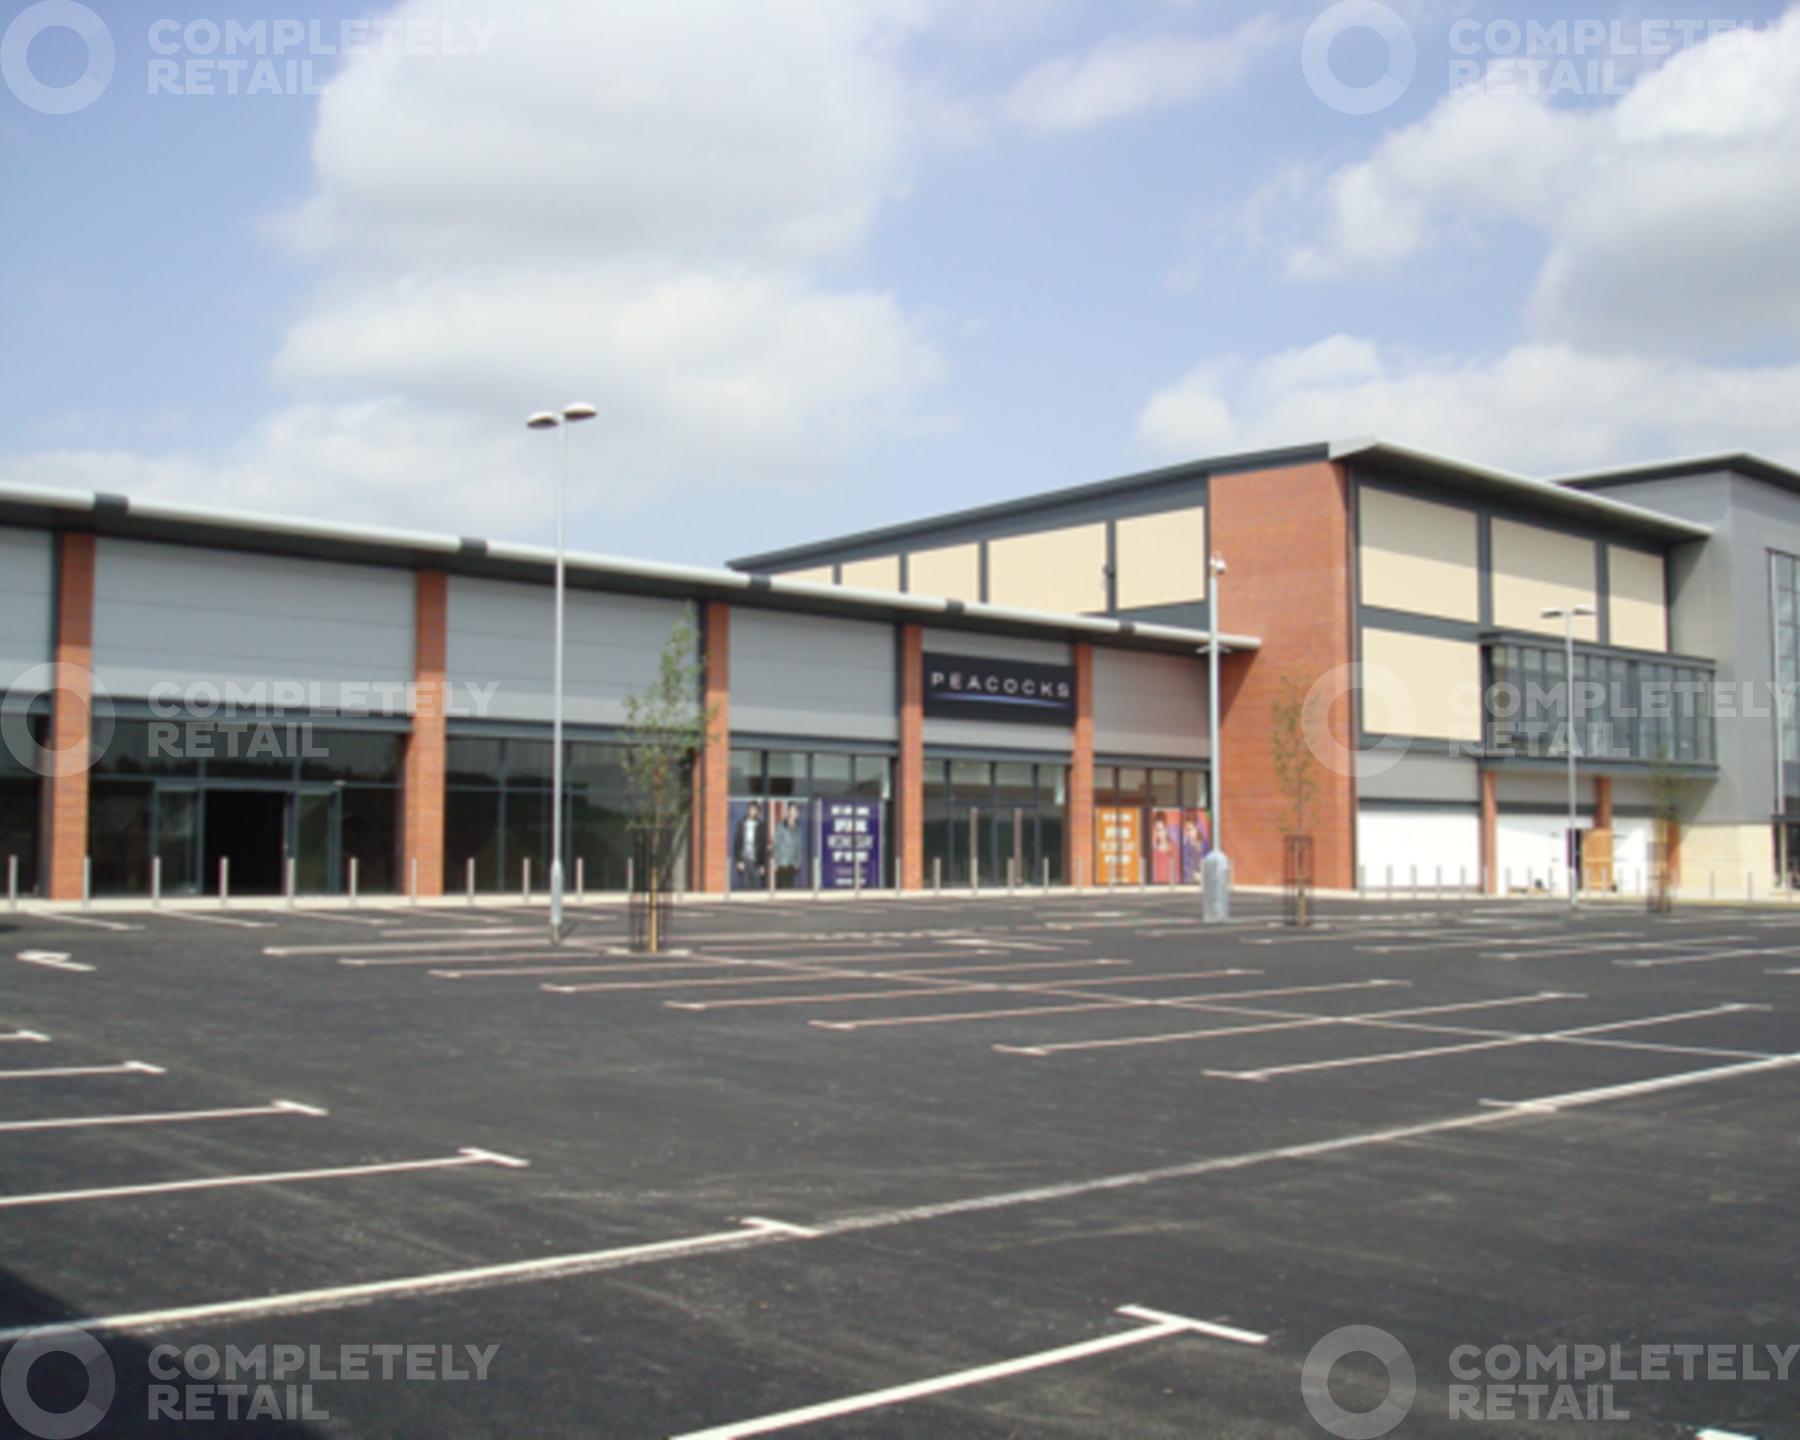 Hepworth Retail Park